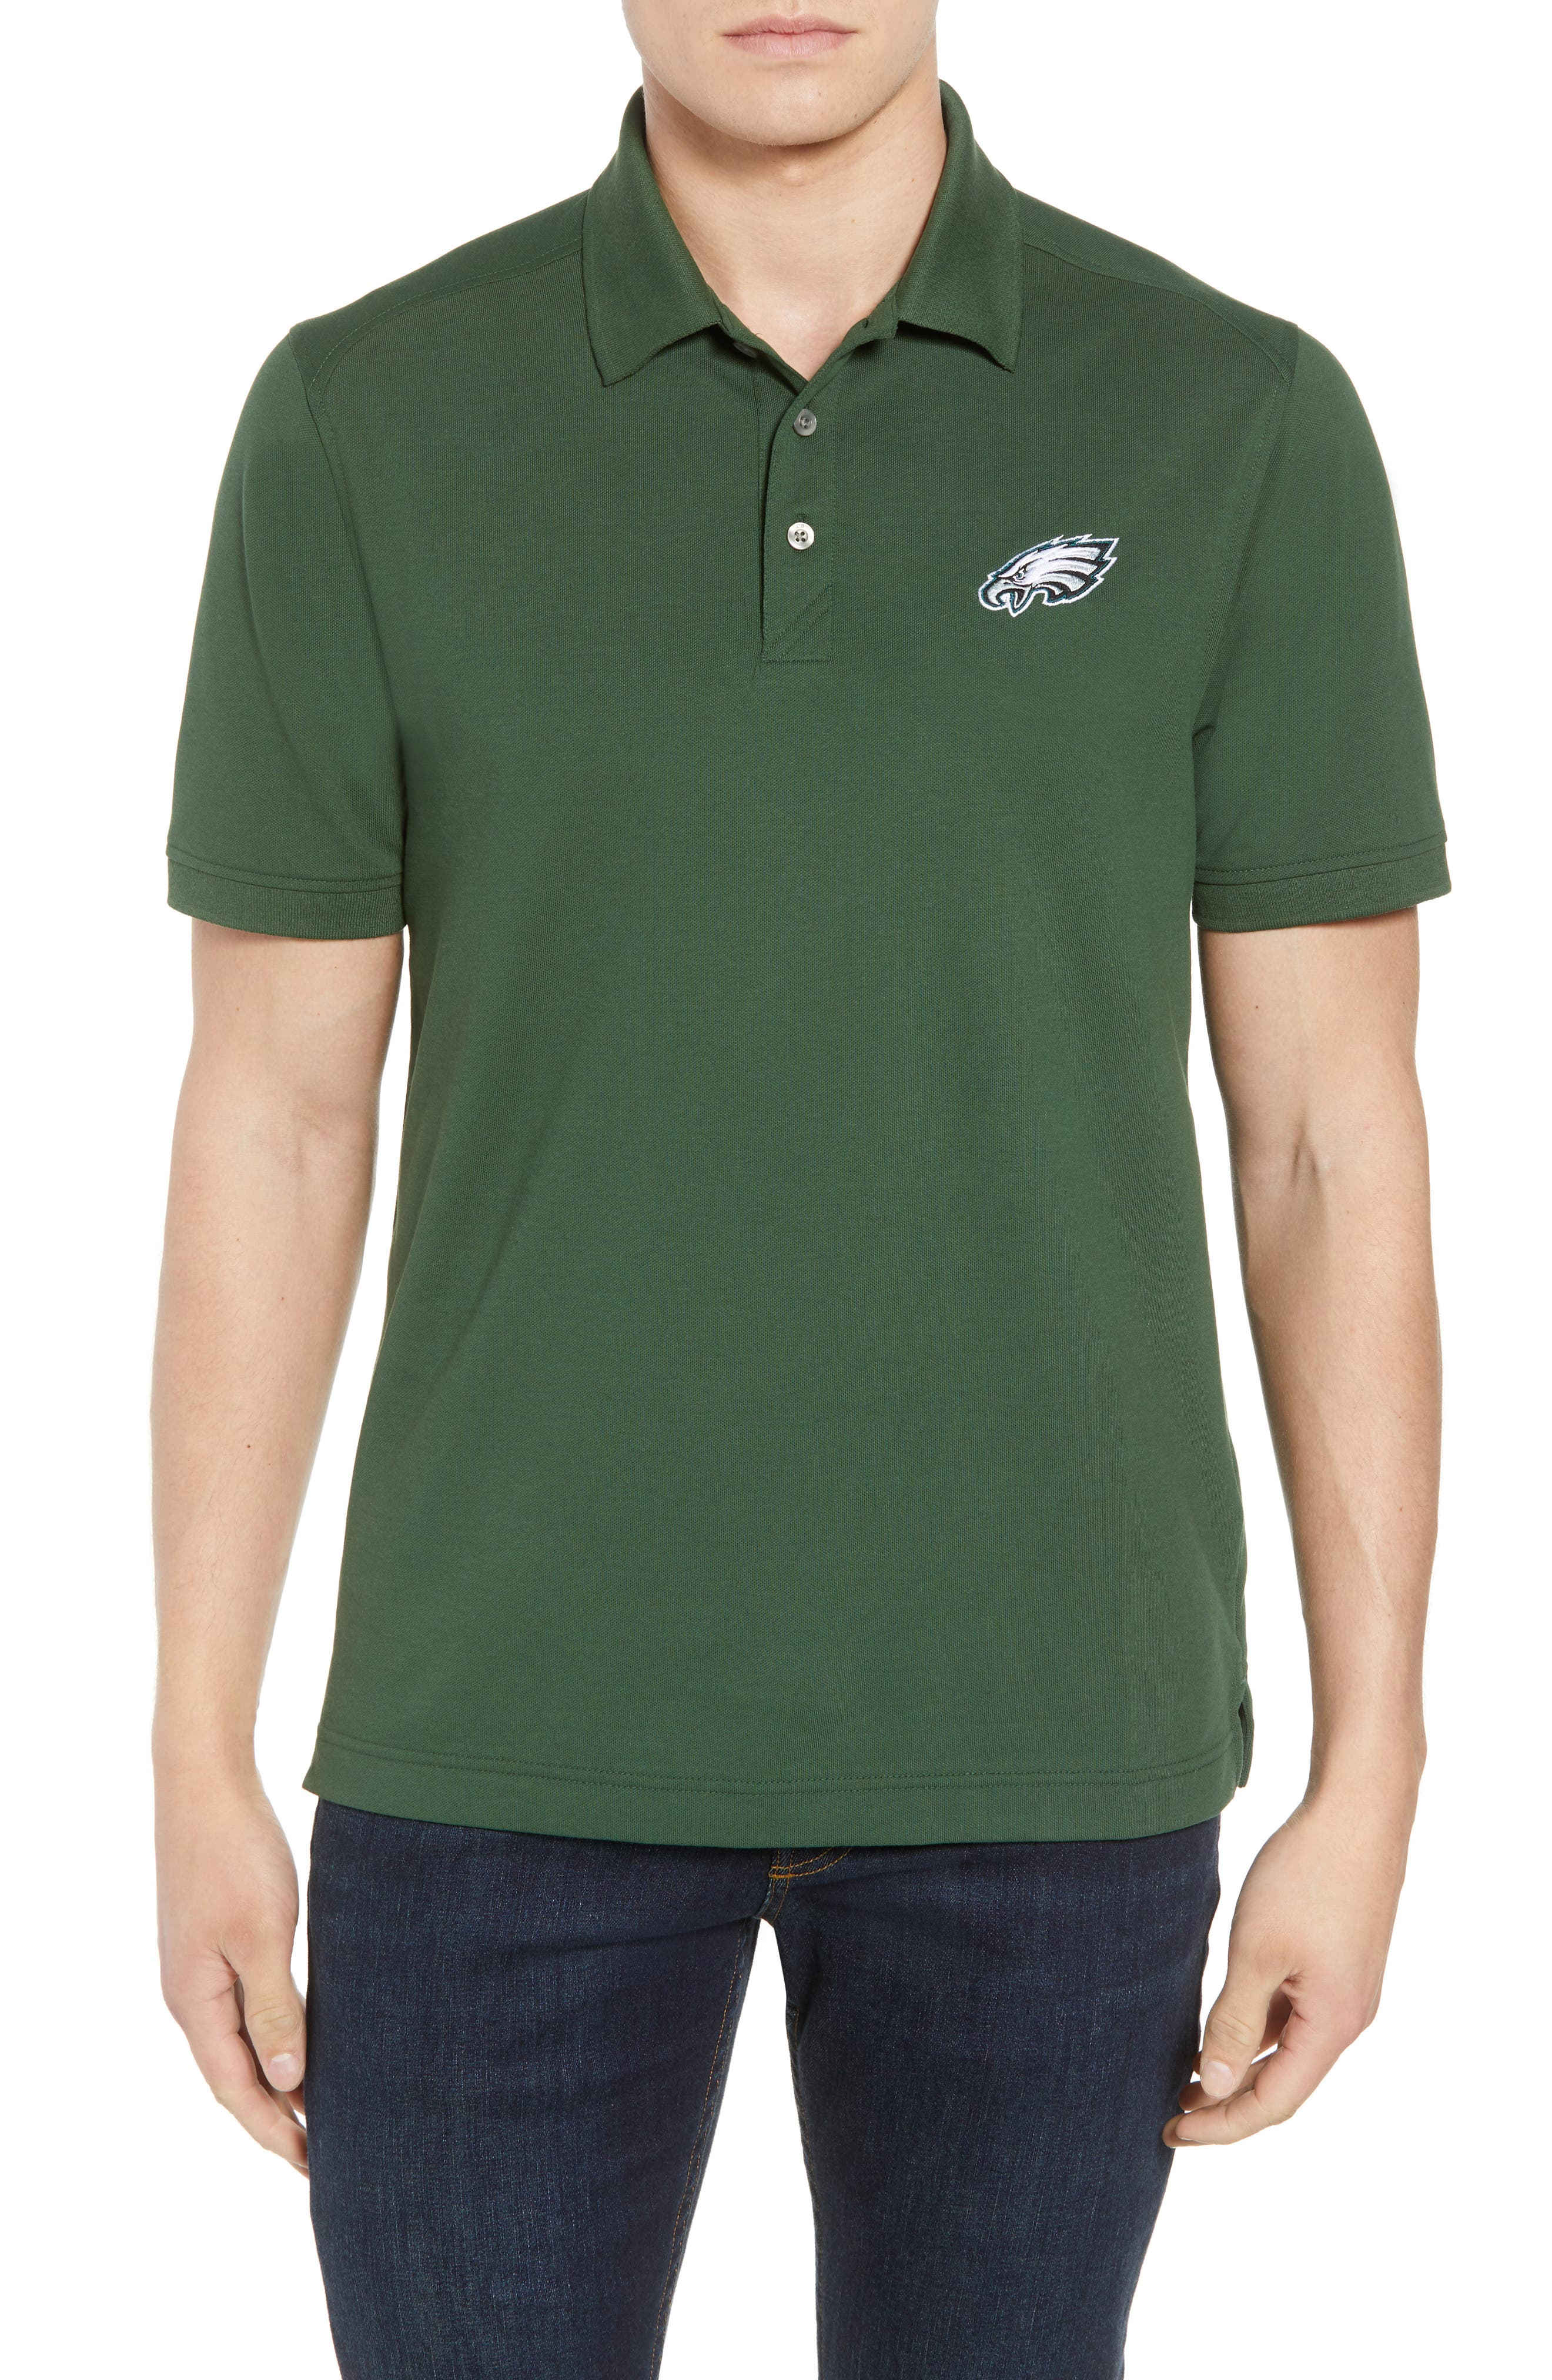 Philadelphia Eagles - Advantage Regular Fit DryTec Polo,                             Main thumbnail 1, color,                             HUNTER GREEN